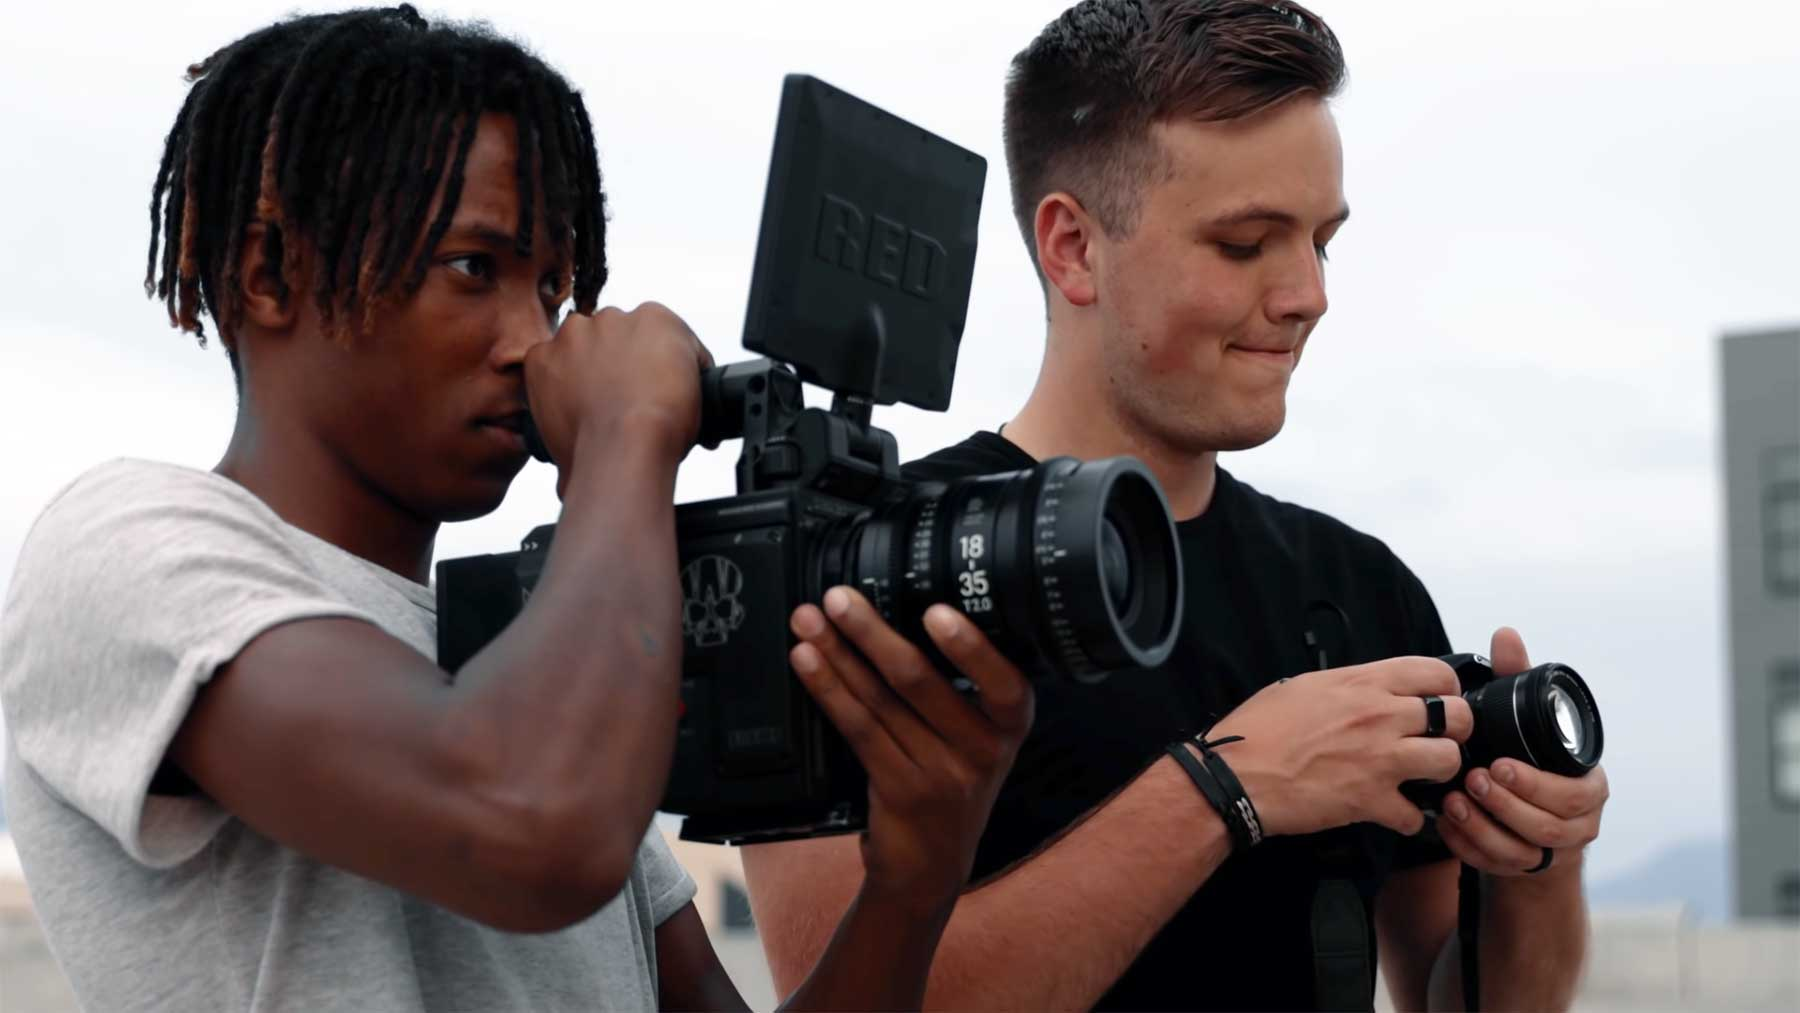 Anfänger mit $30,000-RED vs Profi mit $600-DSLR-Kamera profi-vs-amateur-filmen